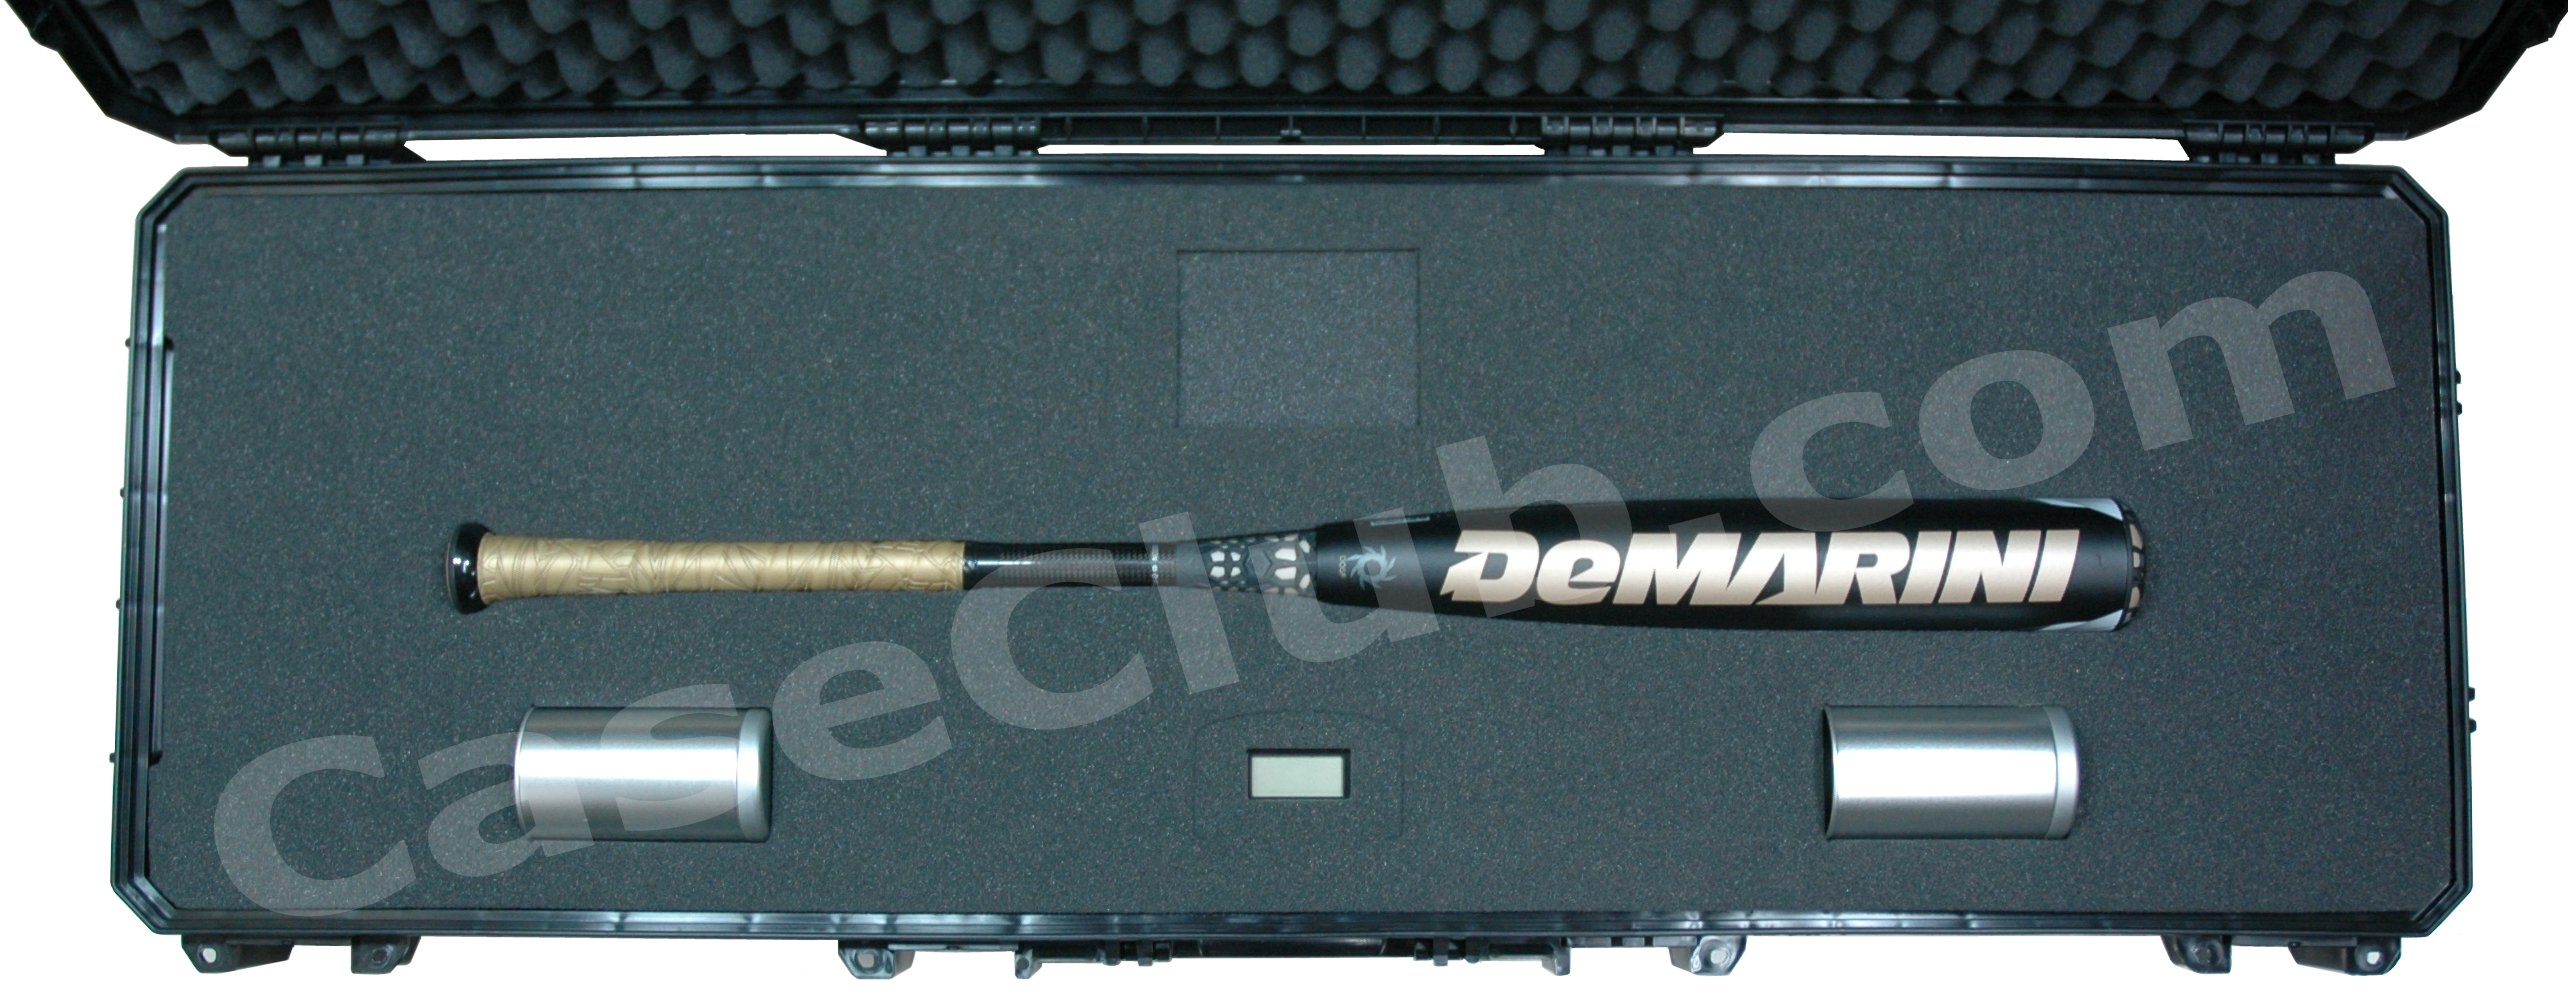 Seahorse 1530 Case Custom Foam Example: Demarini Voodoo Overlord BBCOR Baseball Bat Case